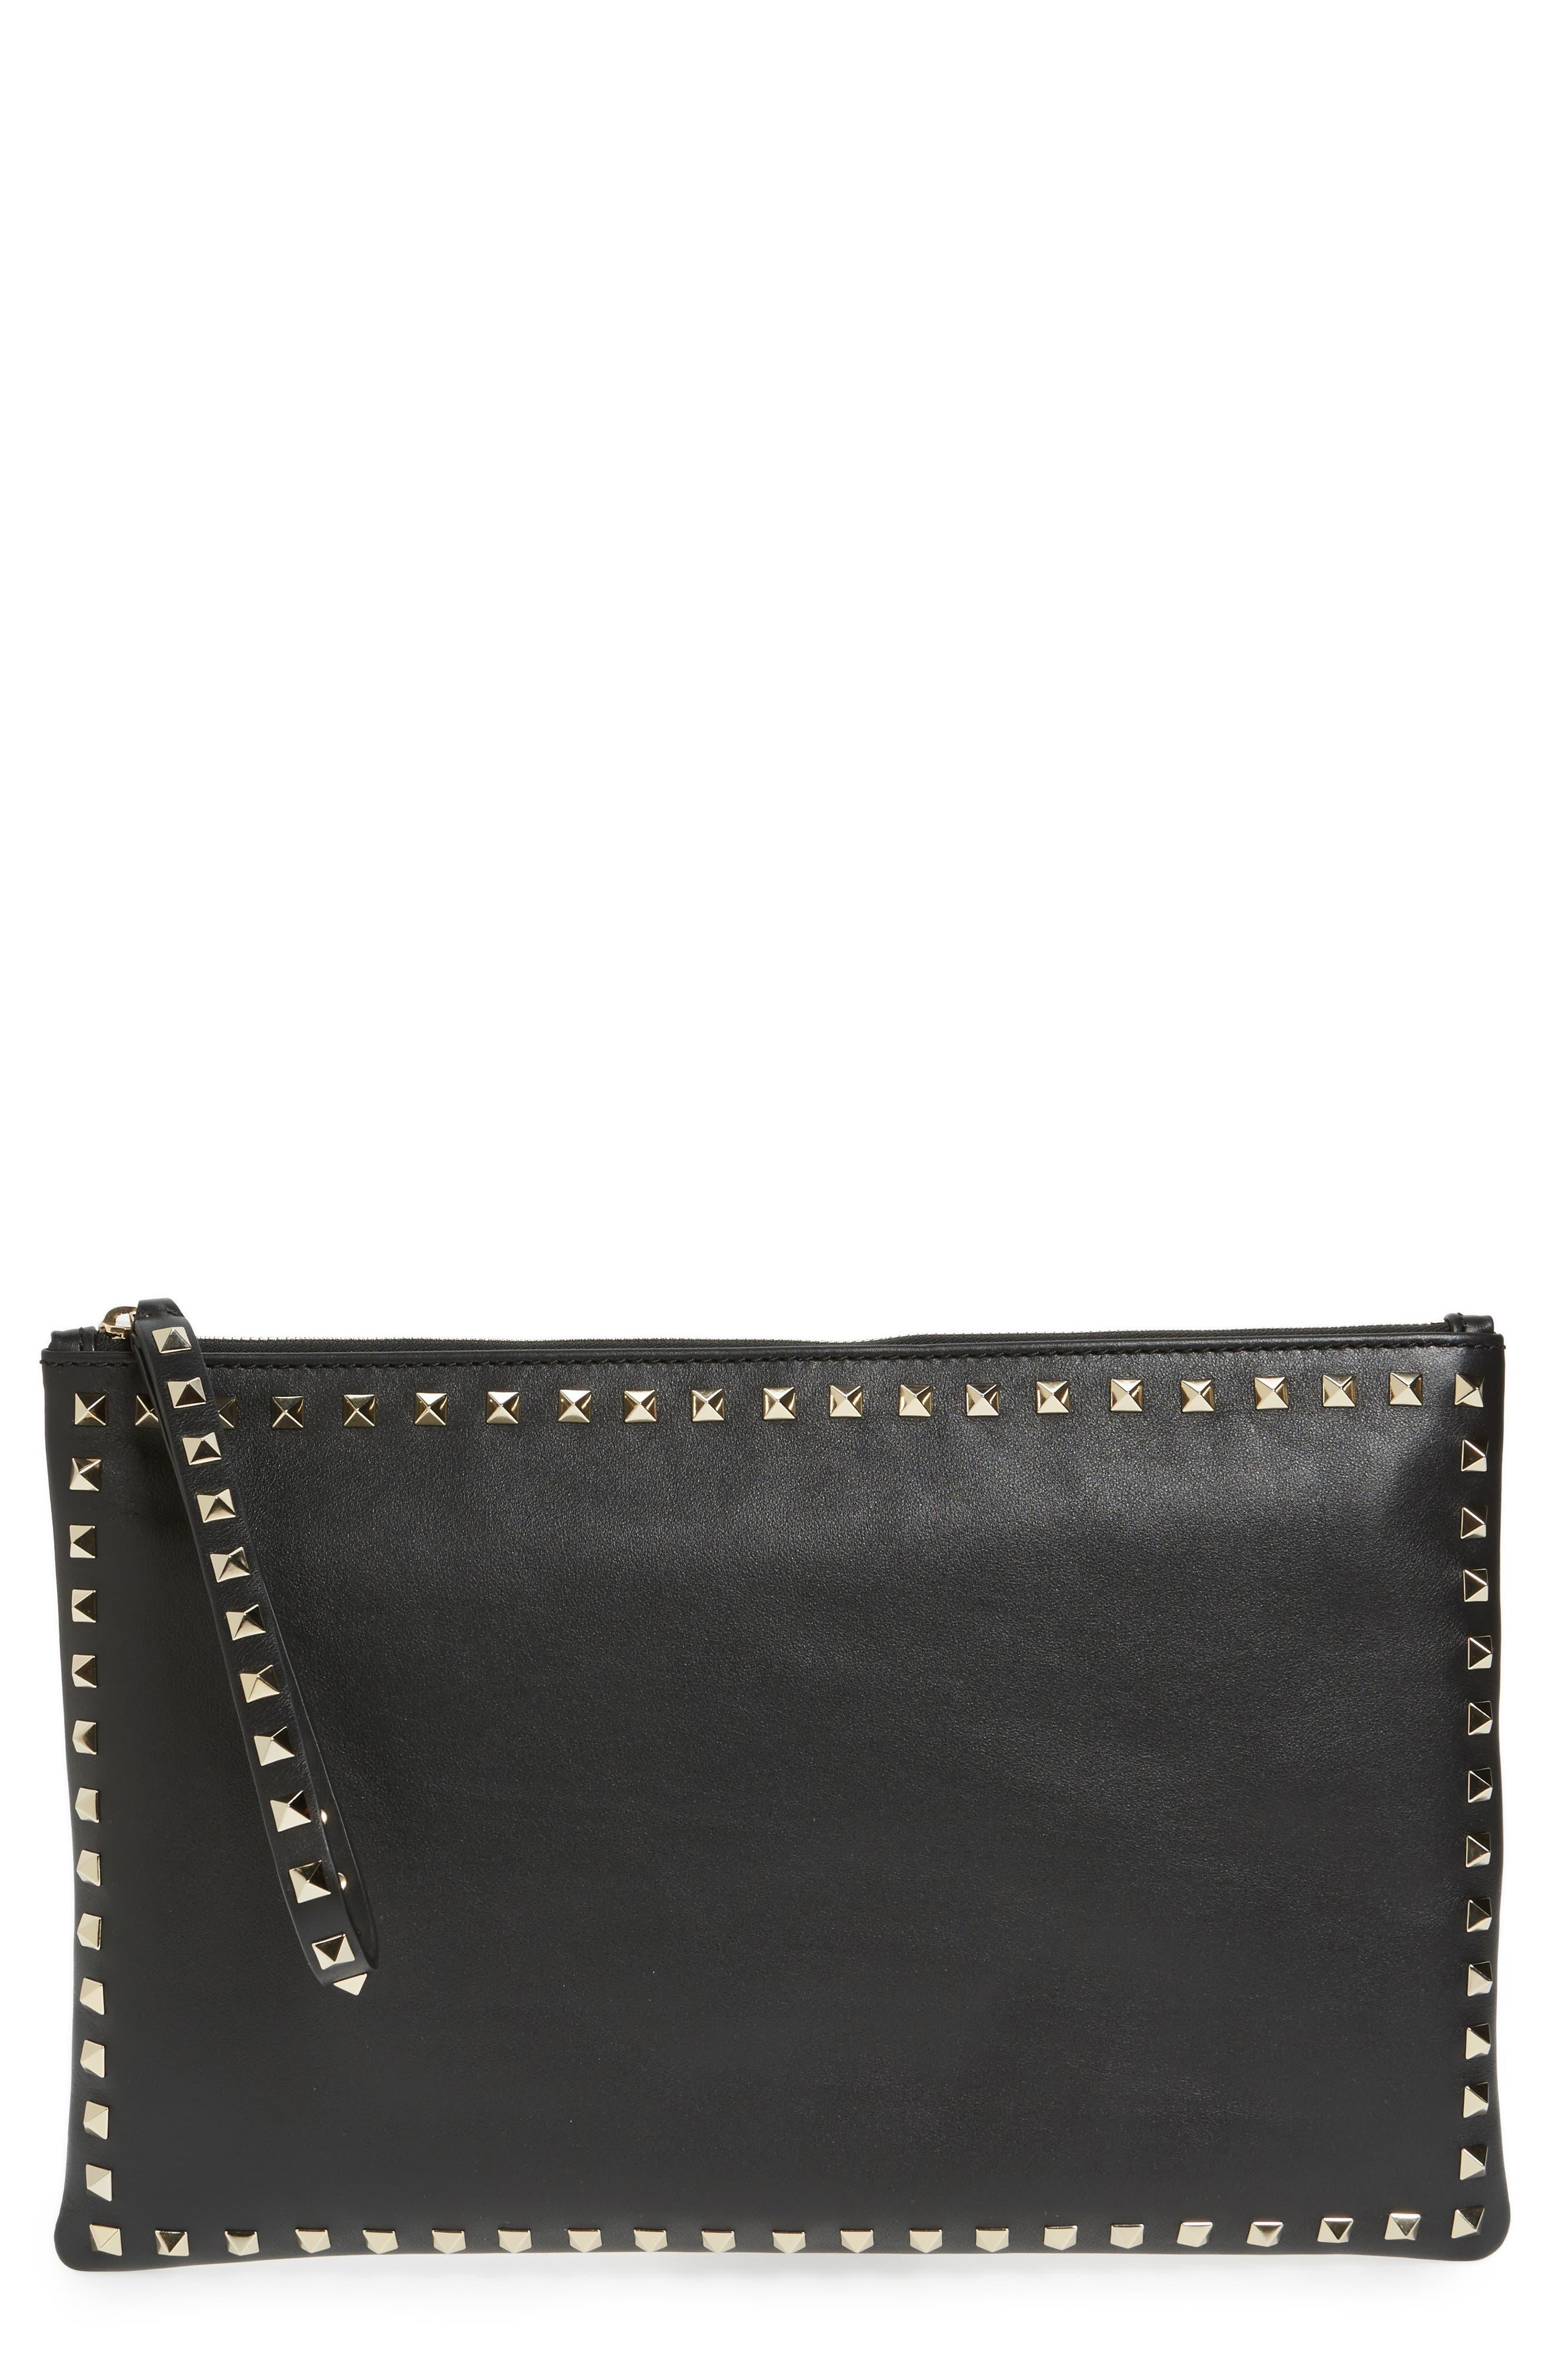 Valentino Small Rockstud Vitello Leather Clutch,                             Main thumbnail 1, color,                             001